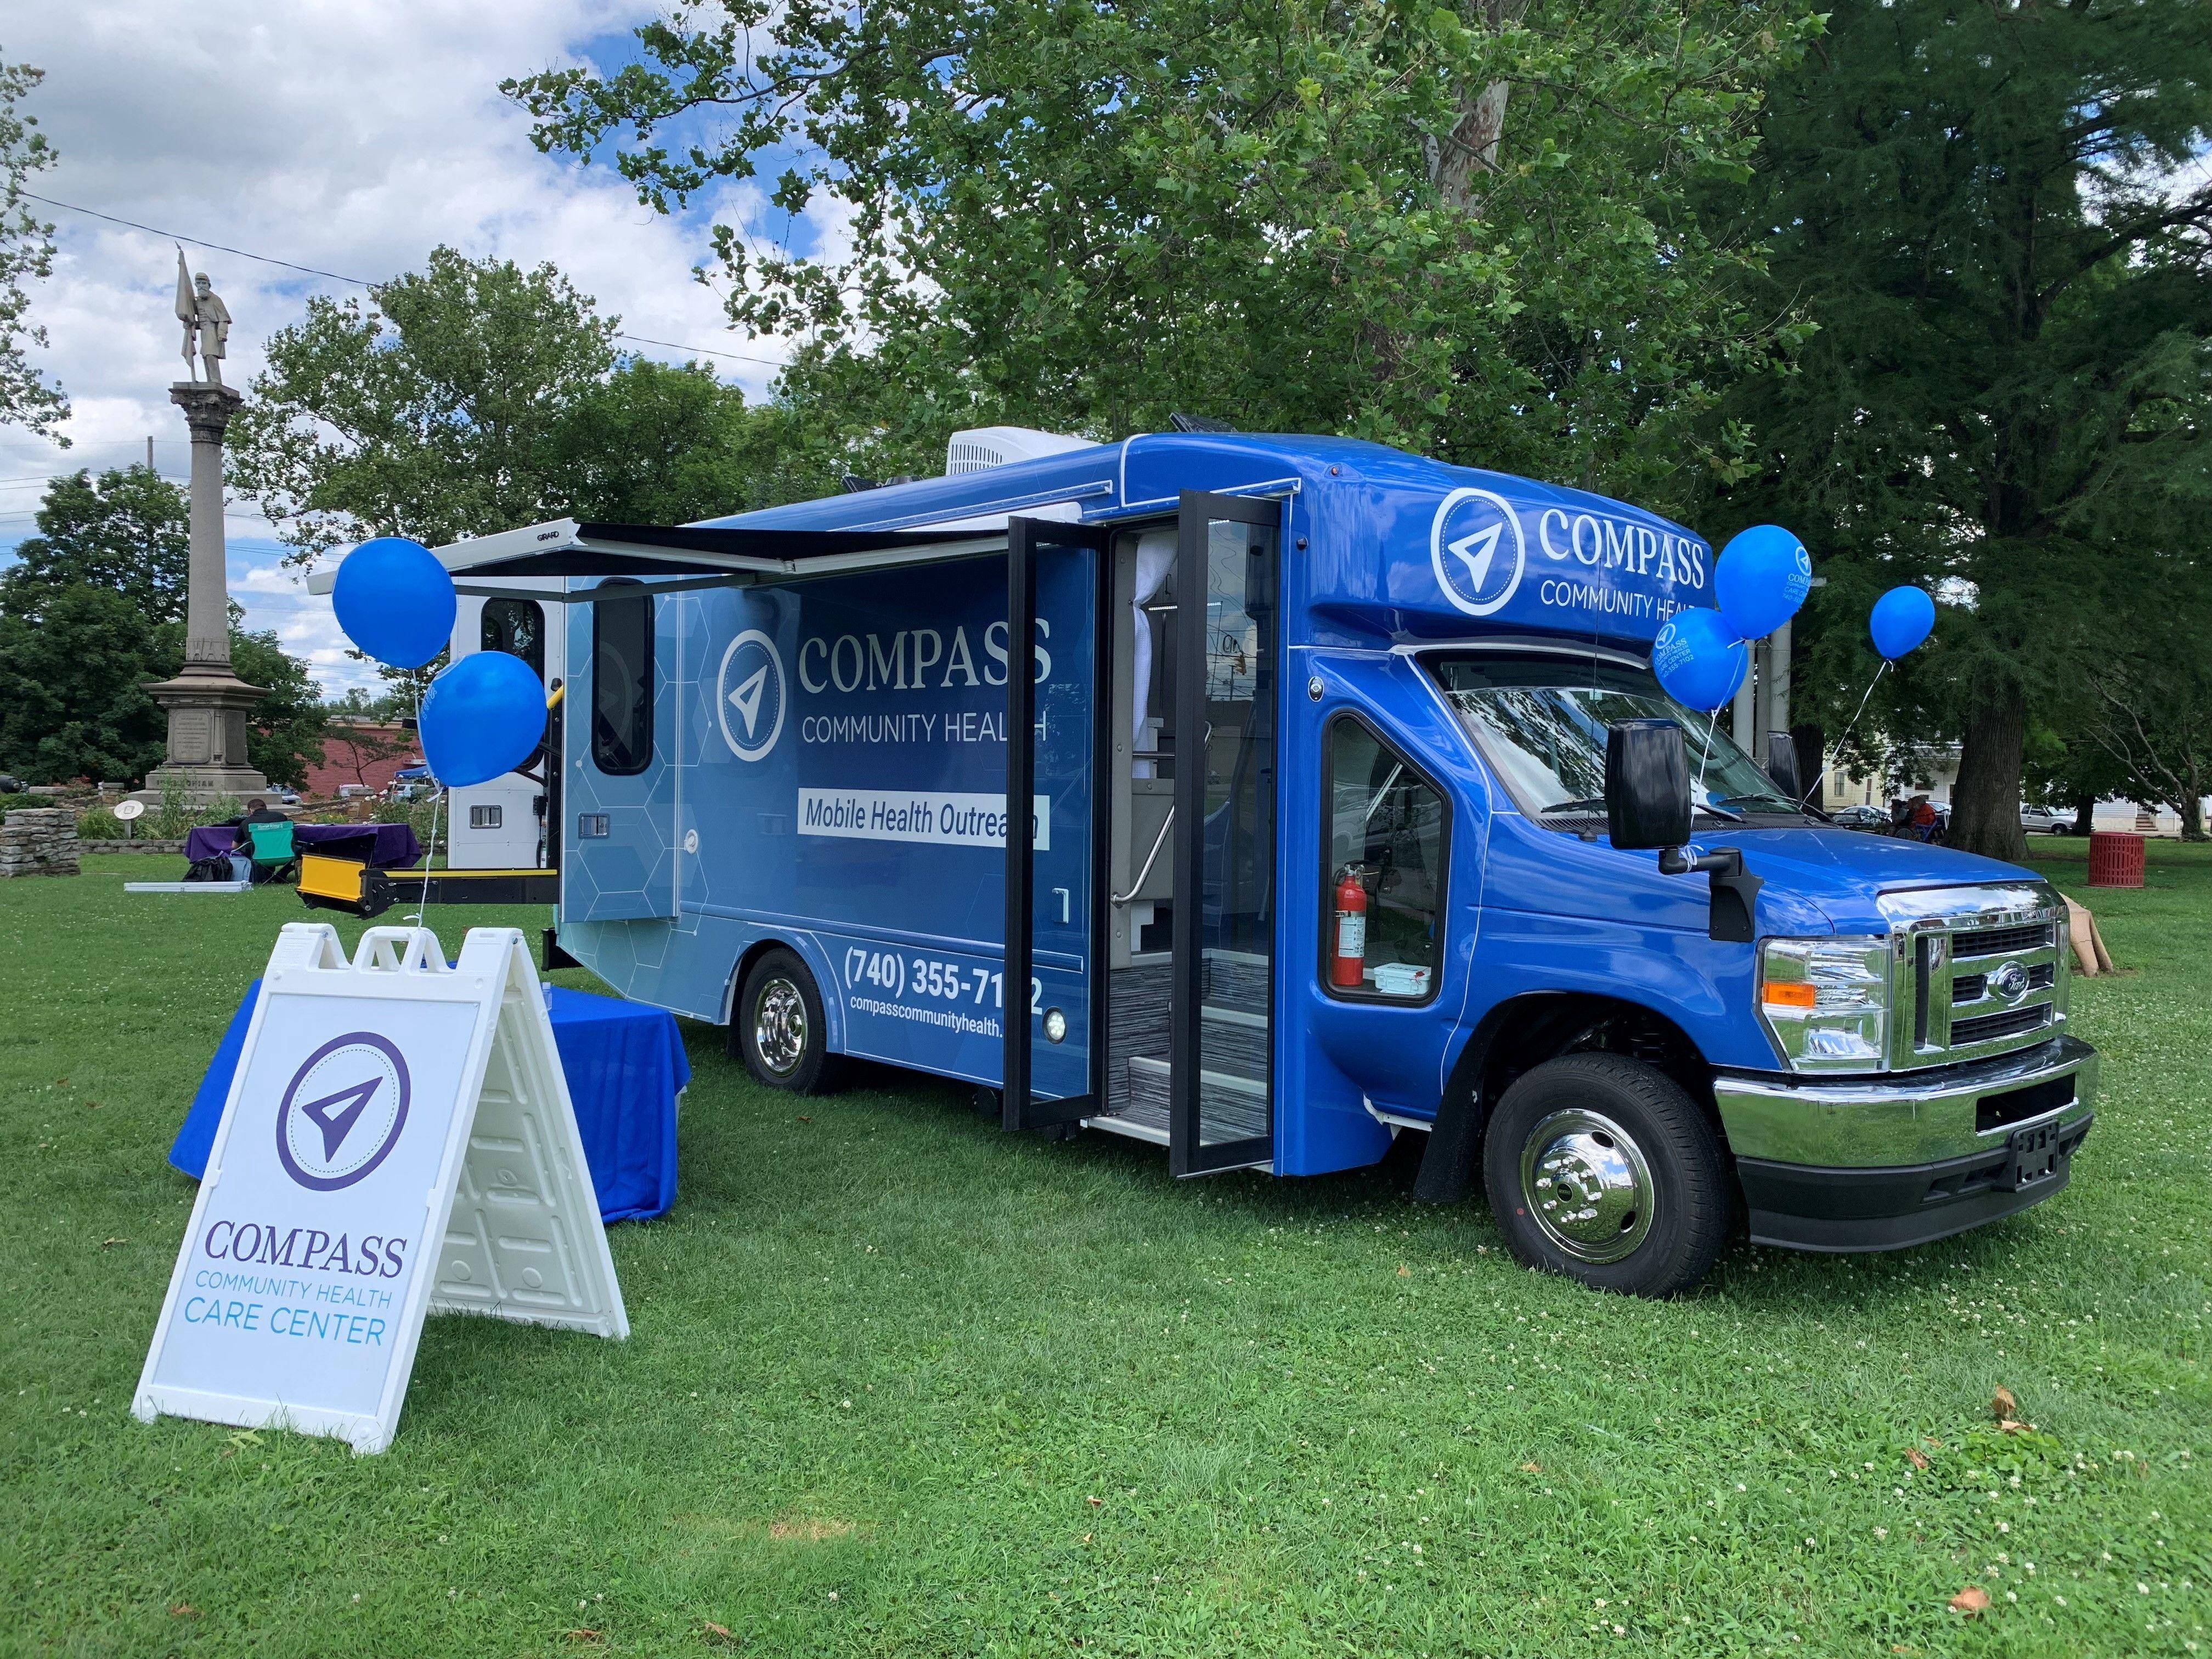 Mobile Health Outreach